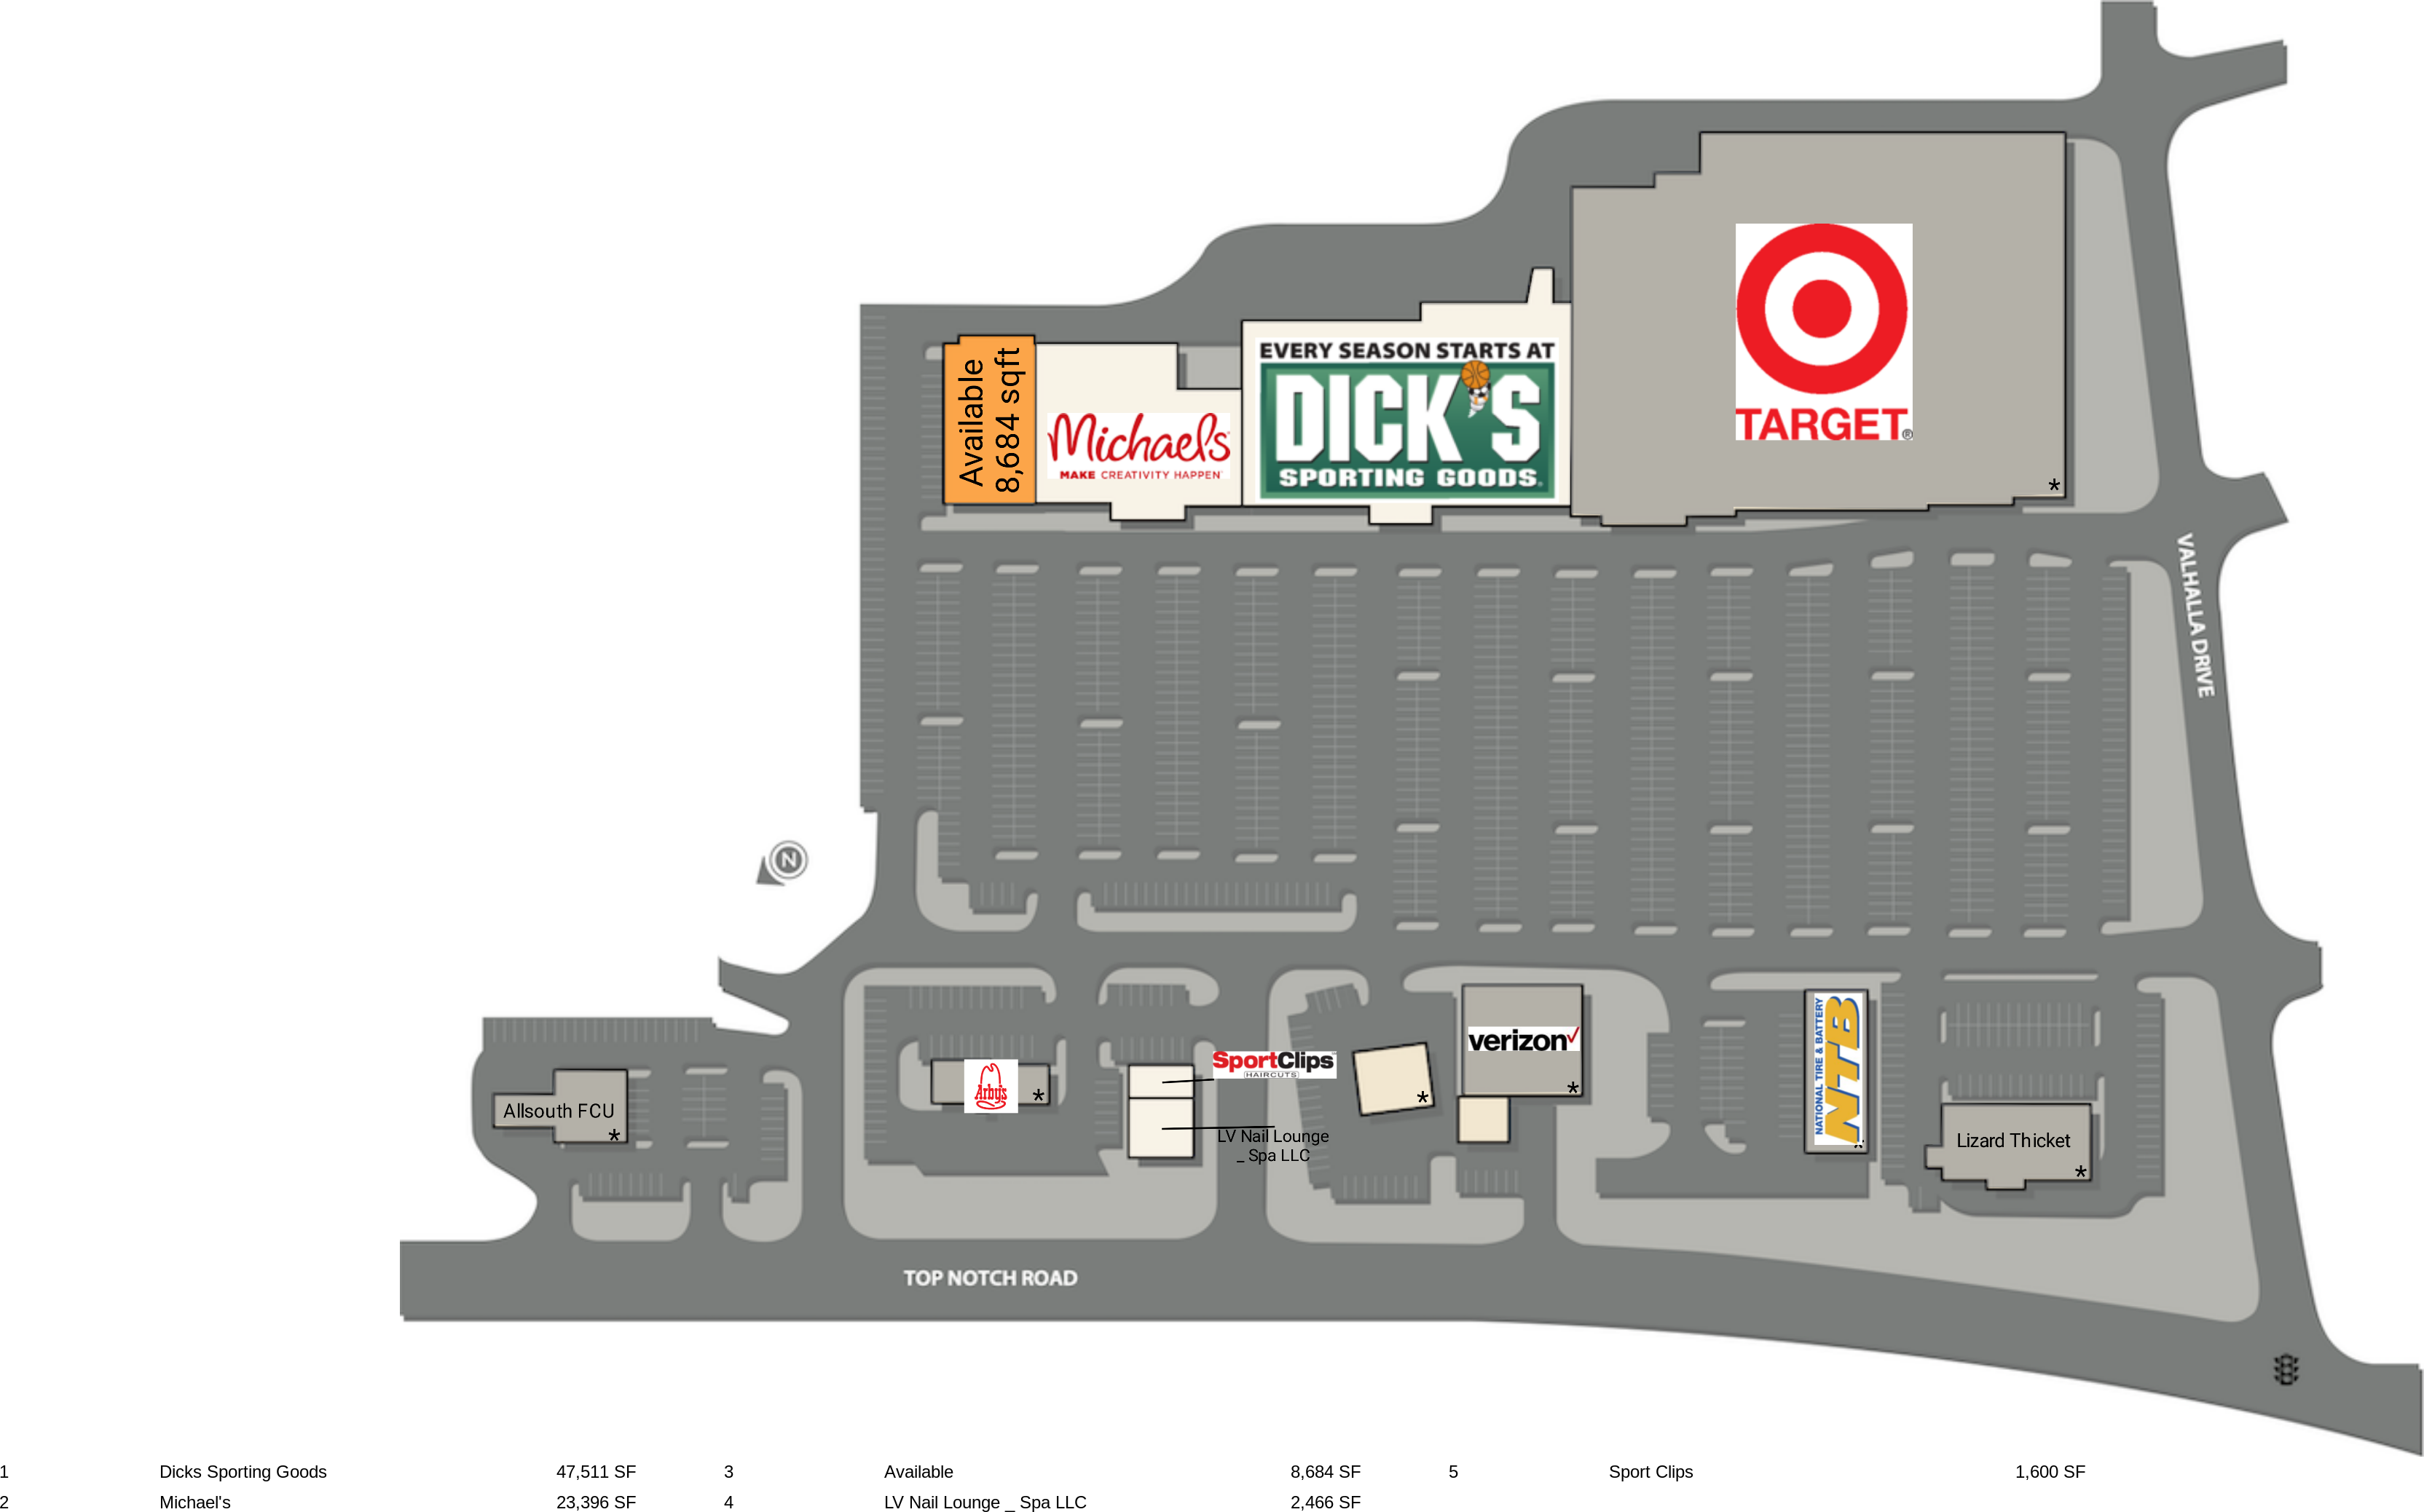 Columbia SC: Target Center - Retail Space - CIM Group